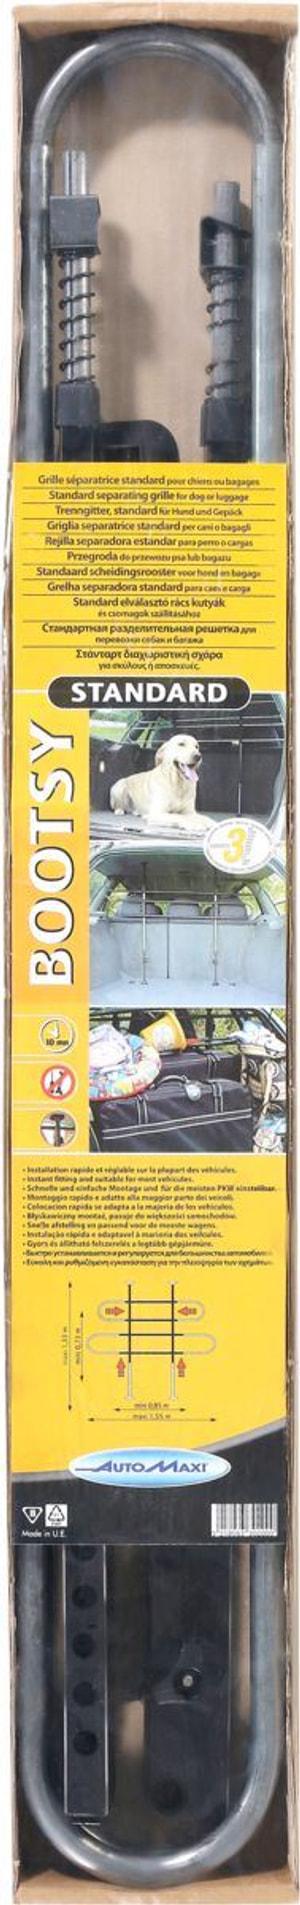 Automaxi  Bootsy Trenngitter